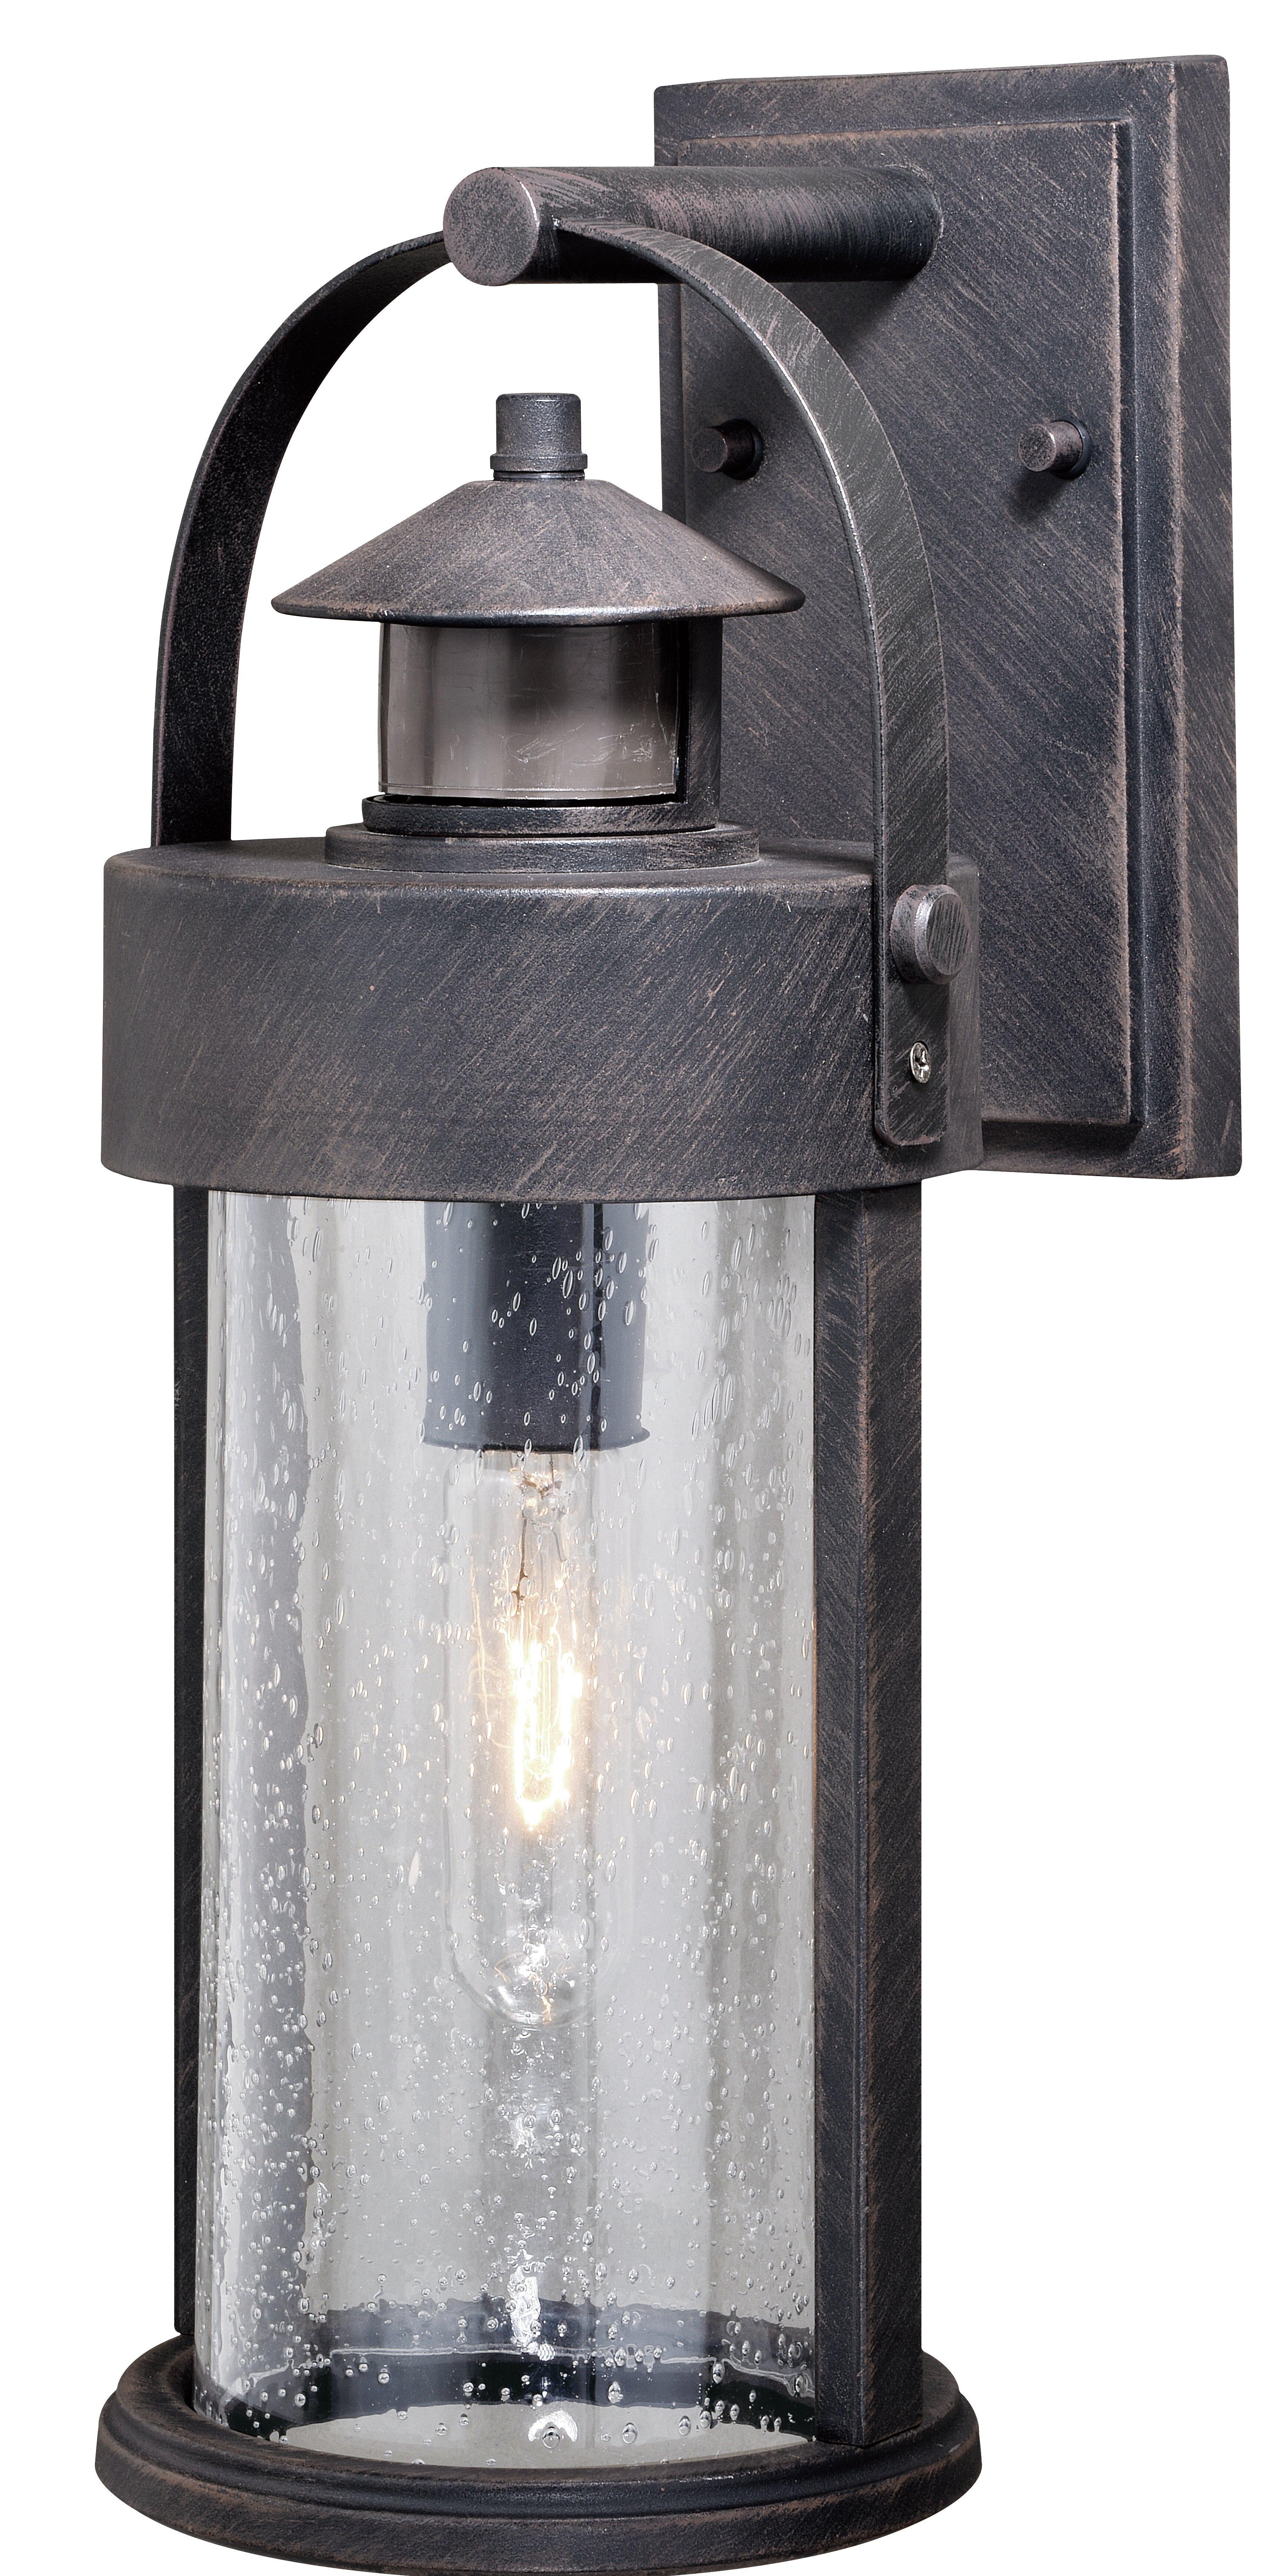 Gracie Oaks Ostman Outdoor Wall Lantern With Motion Sensor Reviews Wayfair Ca